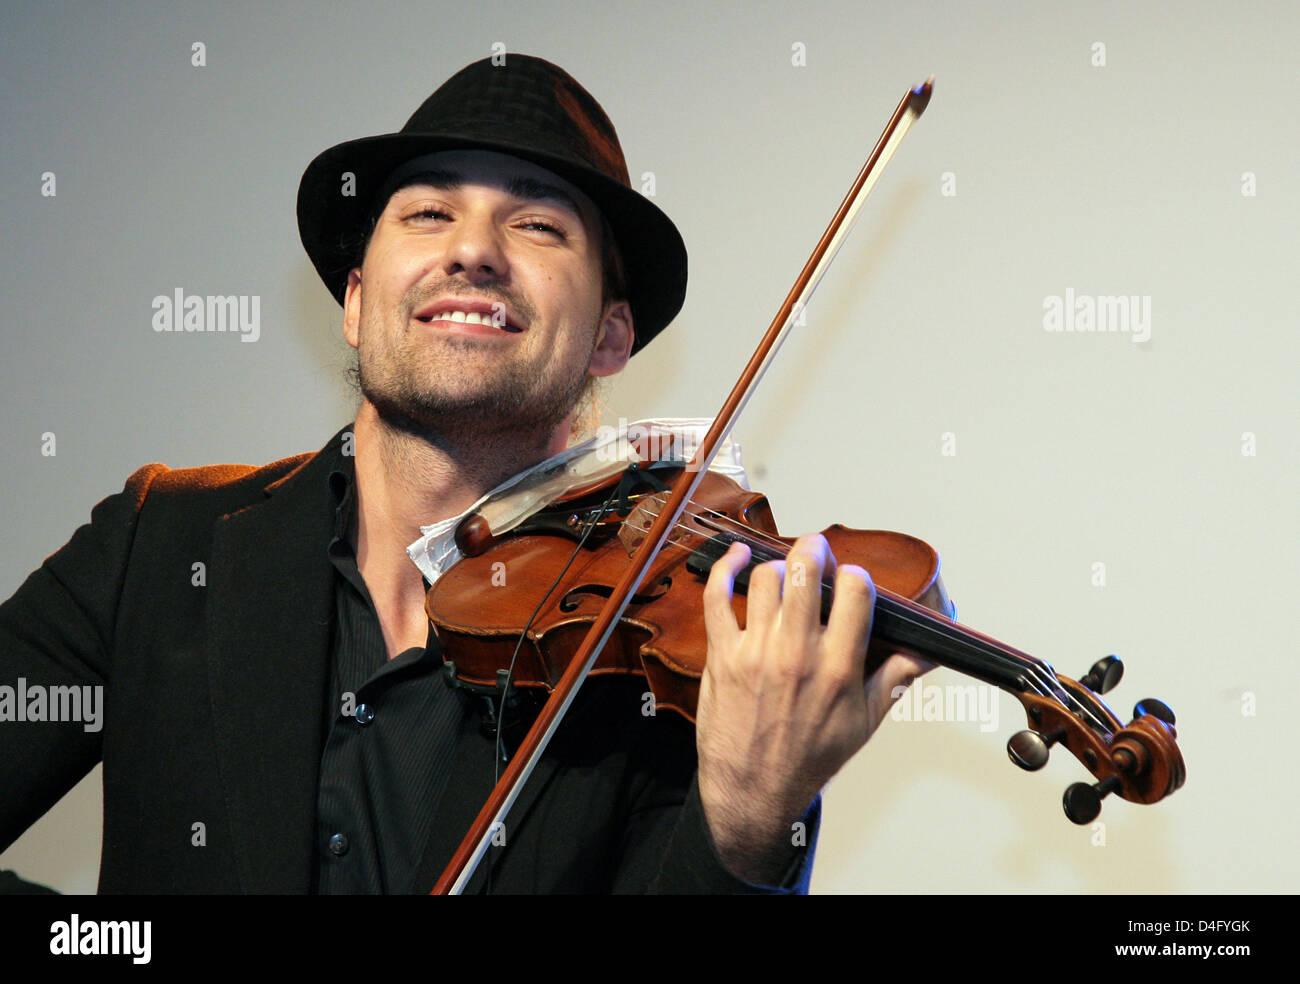 German star violinist David Garrett performs during a Montblanc watch presentation at KaDeWe in Berlin, Germany, Stock Photo